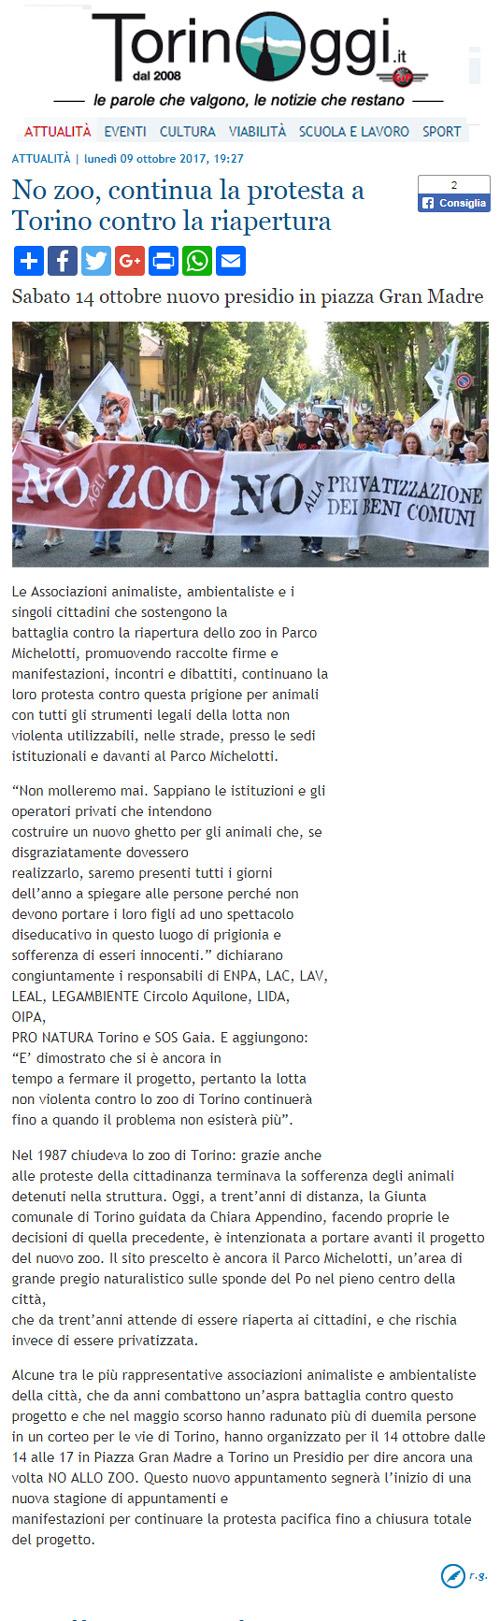 Torino Oggi - 9 ottobre 2017 - Presidio NO AGLI ZOO, 14 ottobre 2017, Torino